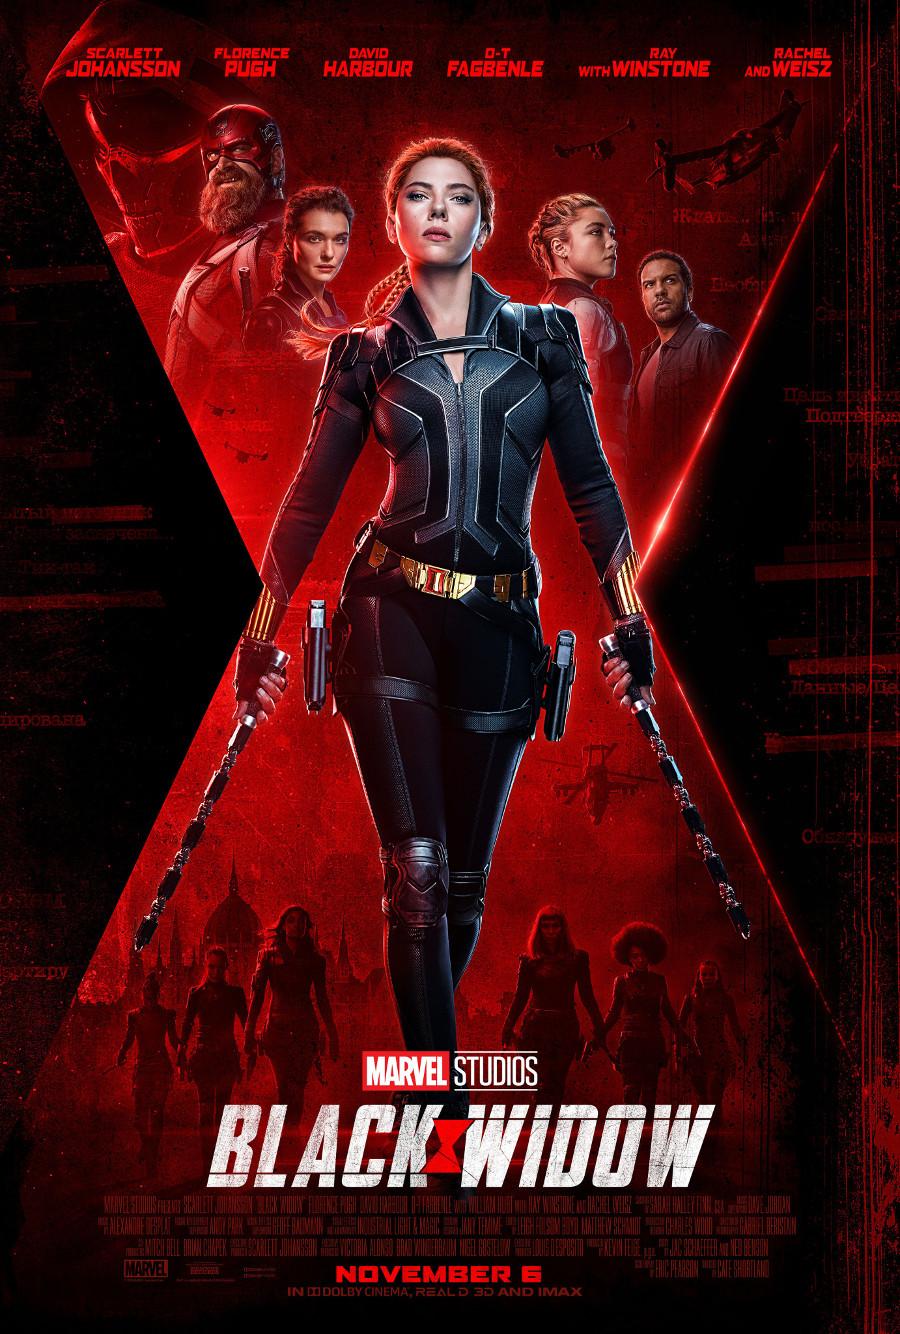 Black Widow Release Date Poster